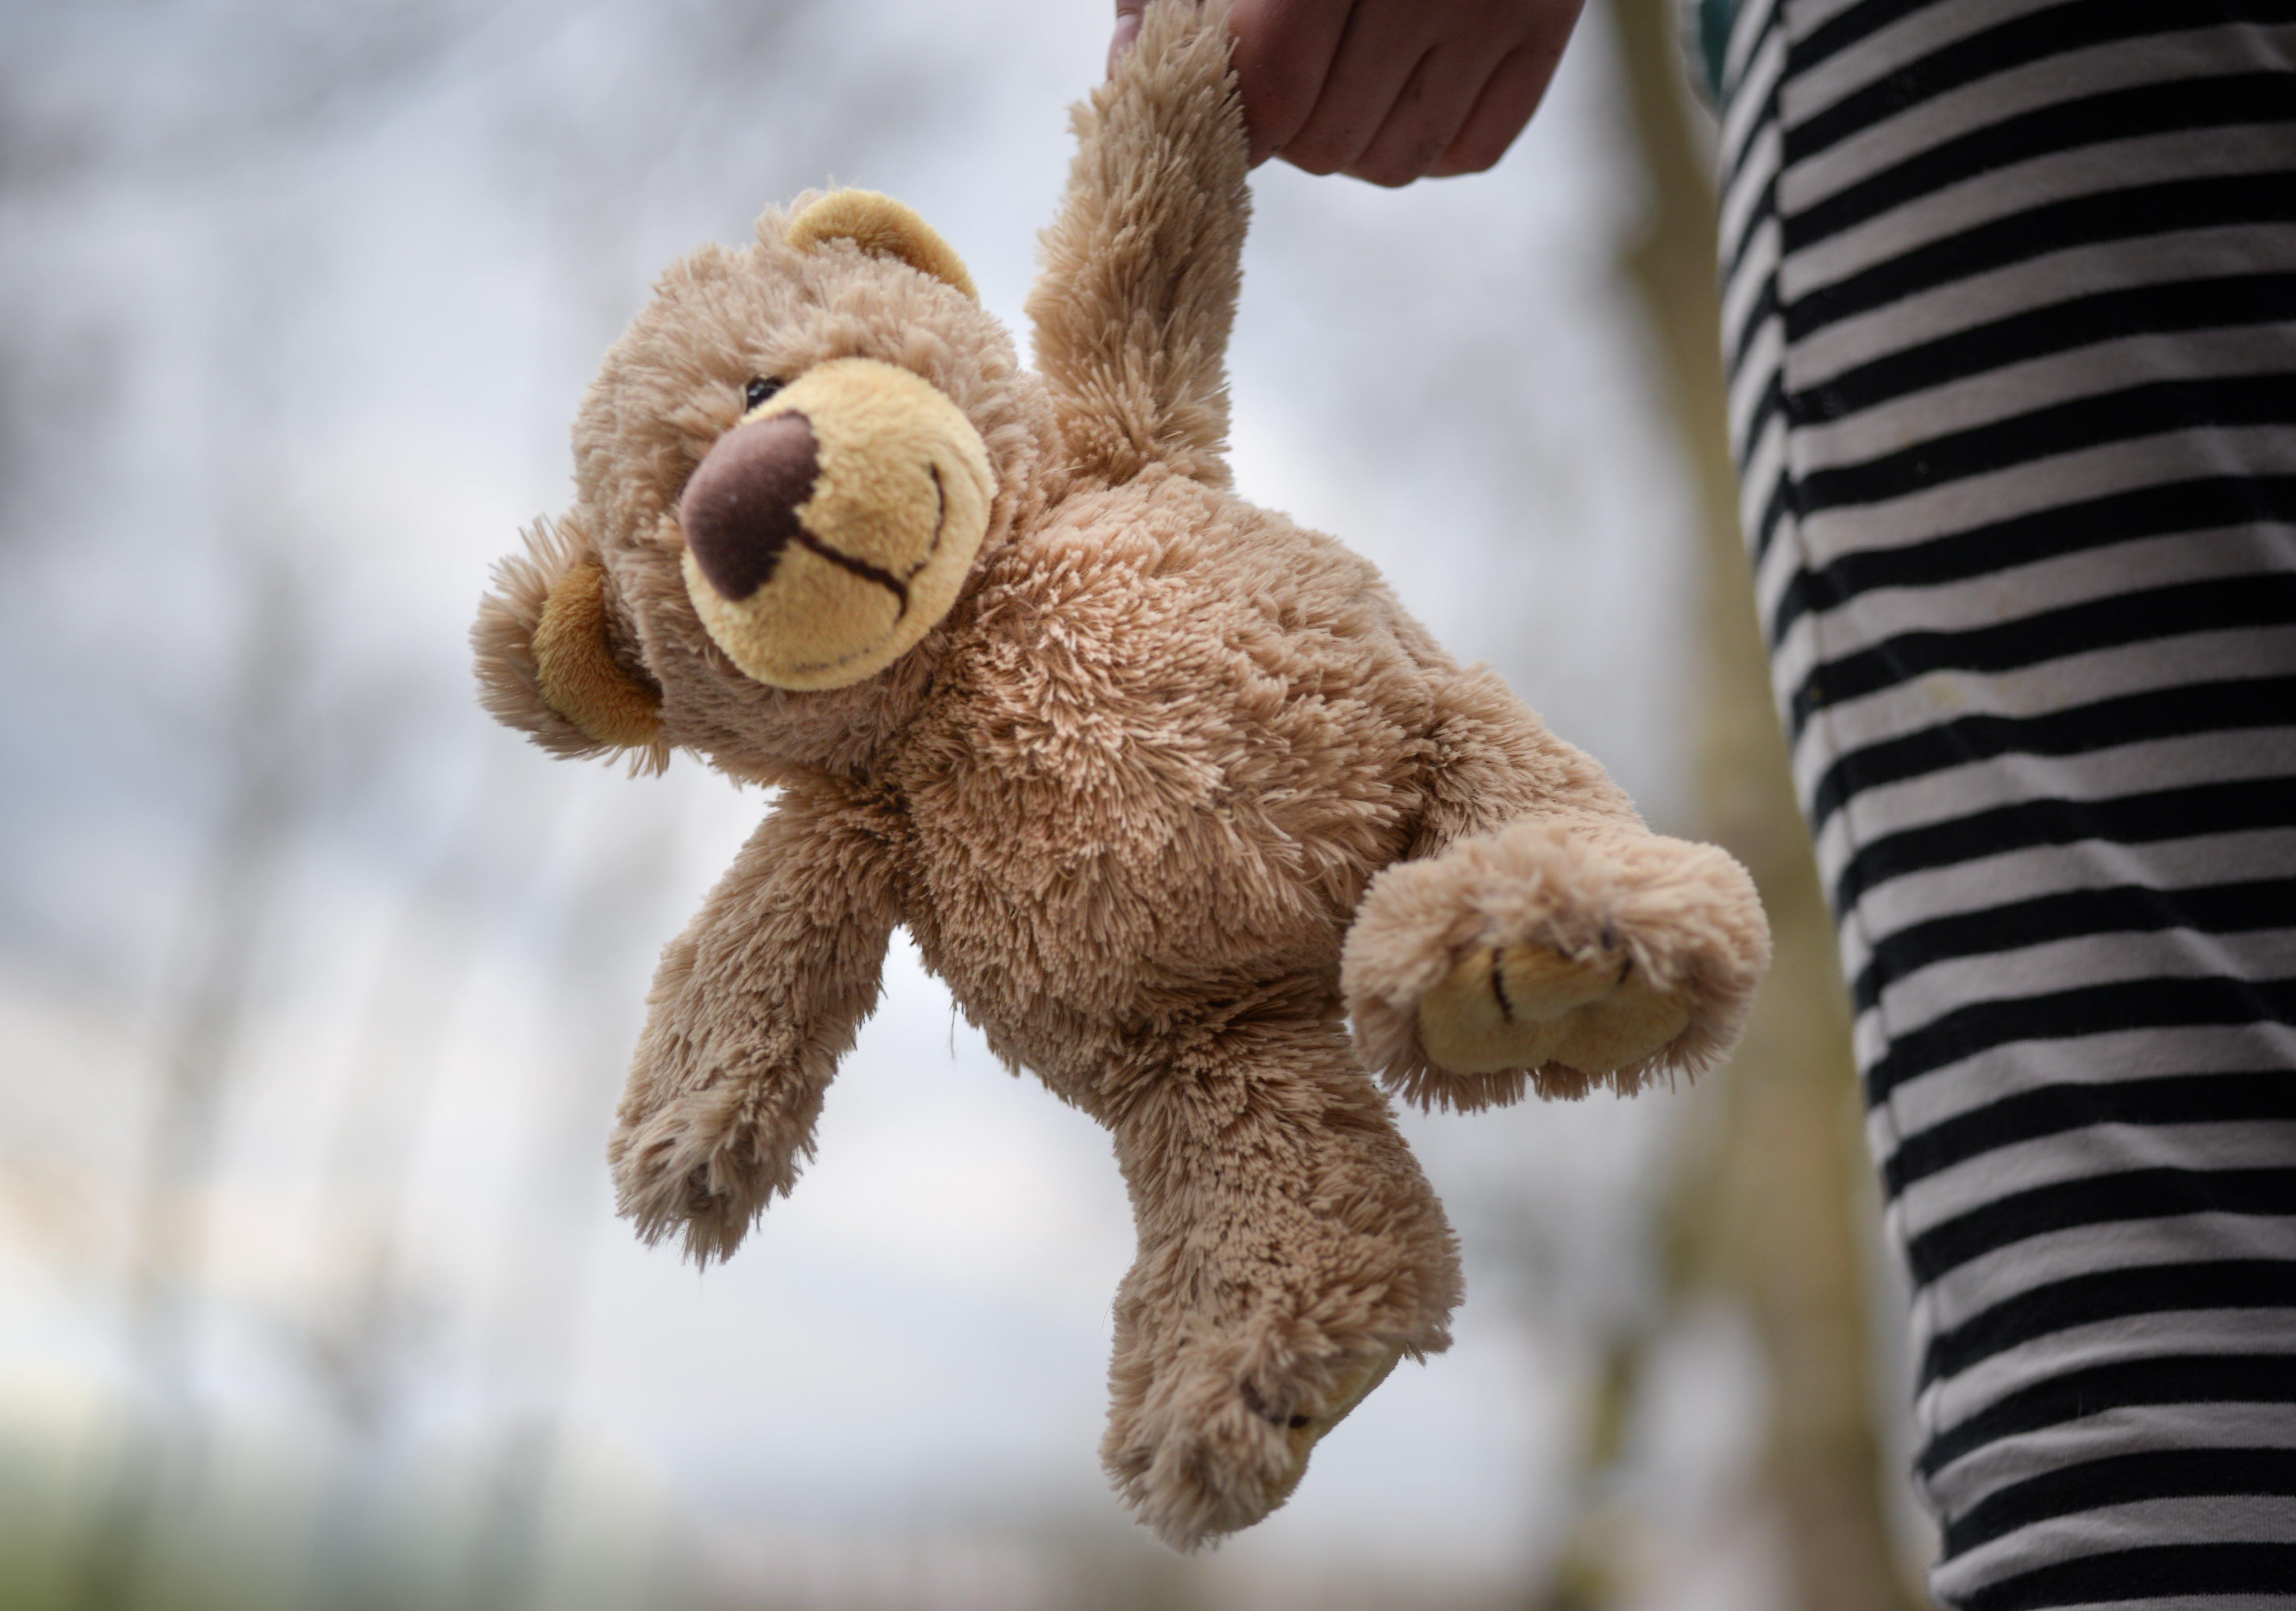 Closeup Photography of Brown Teddy Bear